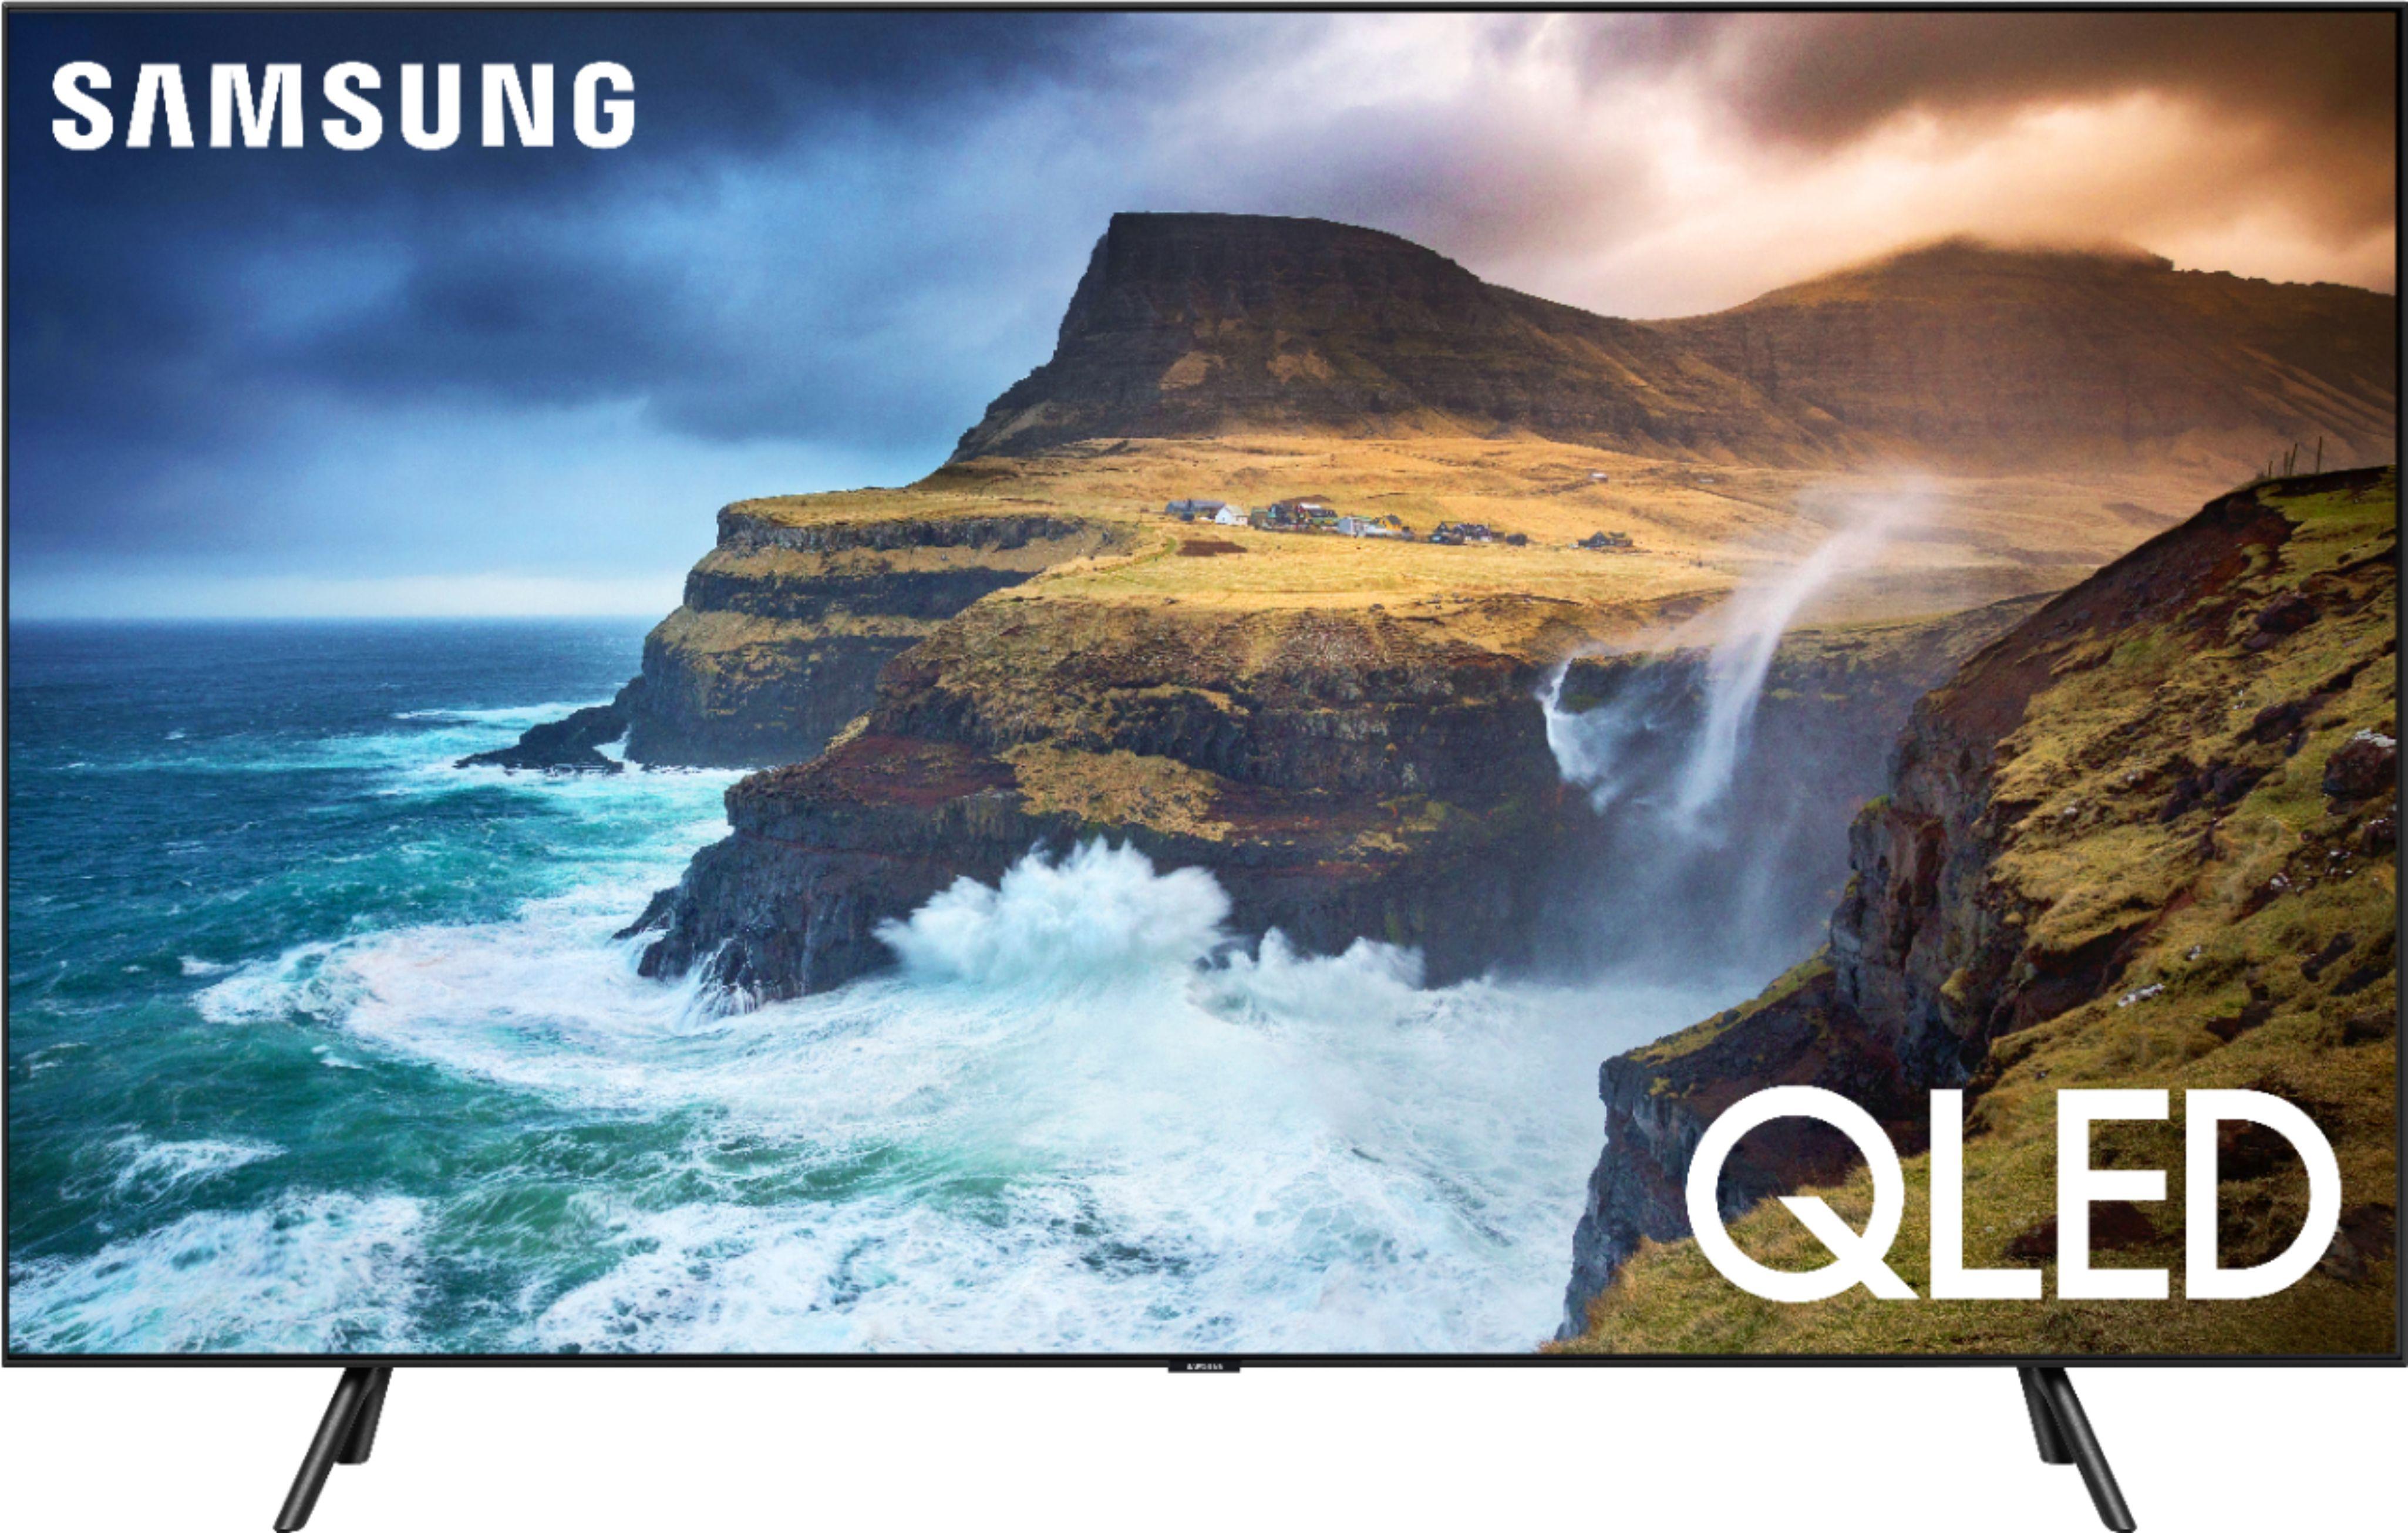 "55"" Samsung QN55Q7DRA Q7D Series 4K UHD HDR Smart QLED HDTV (2019 Model) $849.99 + Free Delivery @ Costco"